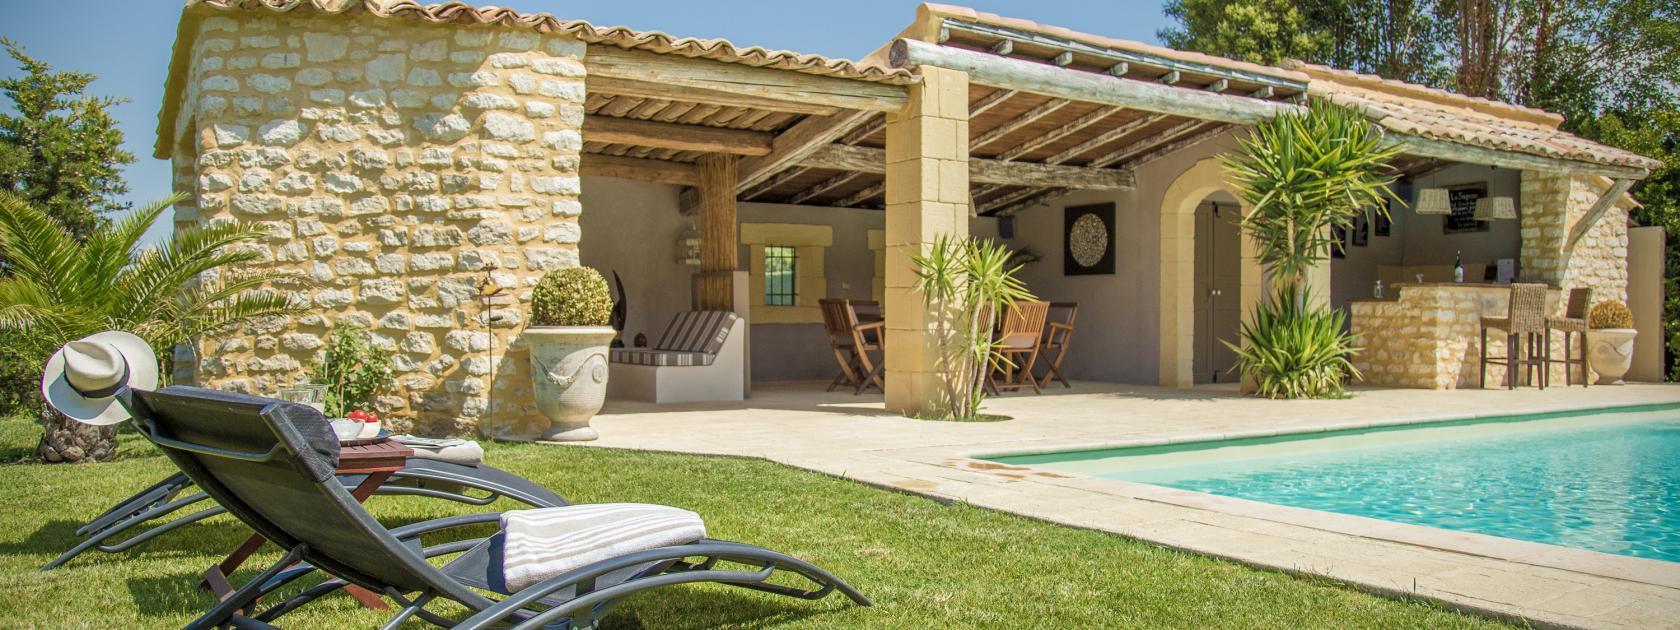 Location vacances maison avec piscine priv e vaucluse Gite de france vaucluse avec piscine